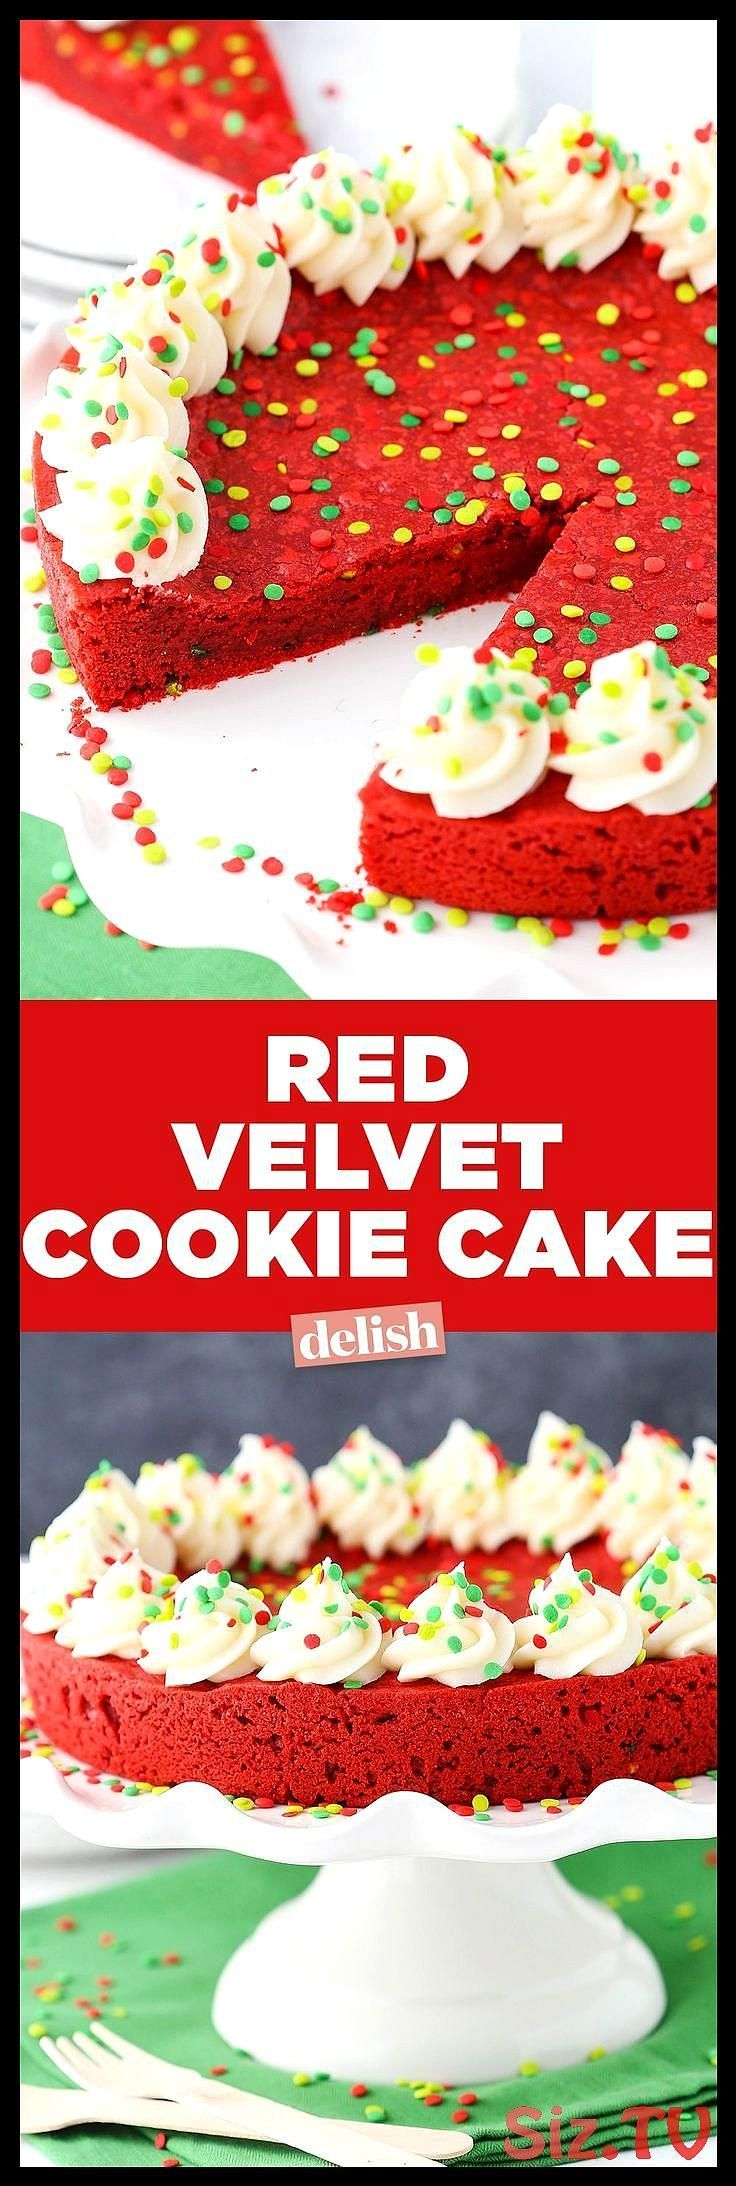 Roter Samt-Pl  tzchen-Kuchen Roter Samt-Pl  tzchen-Kuchen Red Velvet Cookie CakeDelish Roter Samt-Pl  tzchen-Kuchen Red Velvet Cookie CakeDelish  #roter #samtplätzchenkuchen #redvelvetcheesecake Roter Samt-Pl  tzchen-Kuchen Roter Samt-Pl  tzchen-Kuchen Red Velvet Cookie CakeDelish Roter Samt-Pl  tzchen-Kuchen Red Velvet Cookie CakeDelish  #roter #samtplätzchenkuchen #redvelvetcheesecake Roter Samt-Pl  tzchen-Kuchen Roter Samt-Pl  tzchen-Kuchen Red Velvet Cookie CakeDelish Roter Samt-Pl  tzchen #redvelvetcheesecake